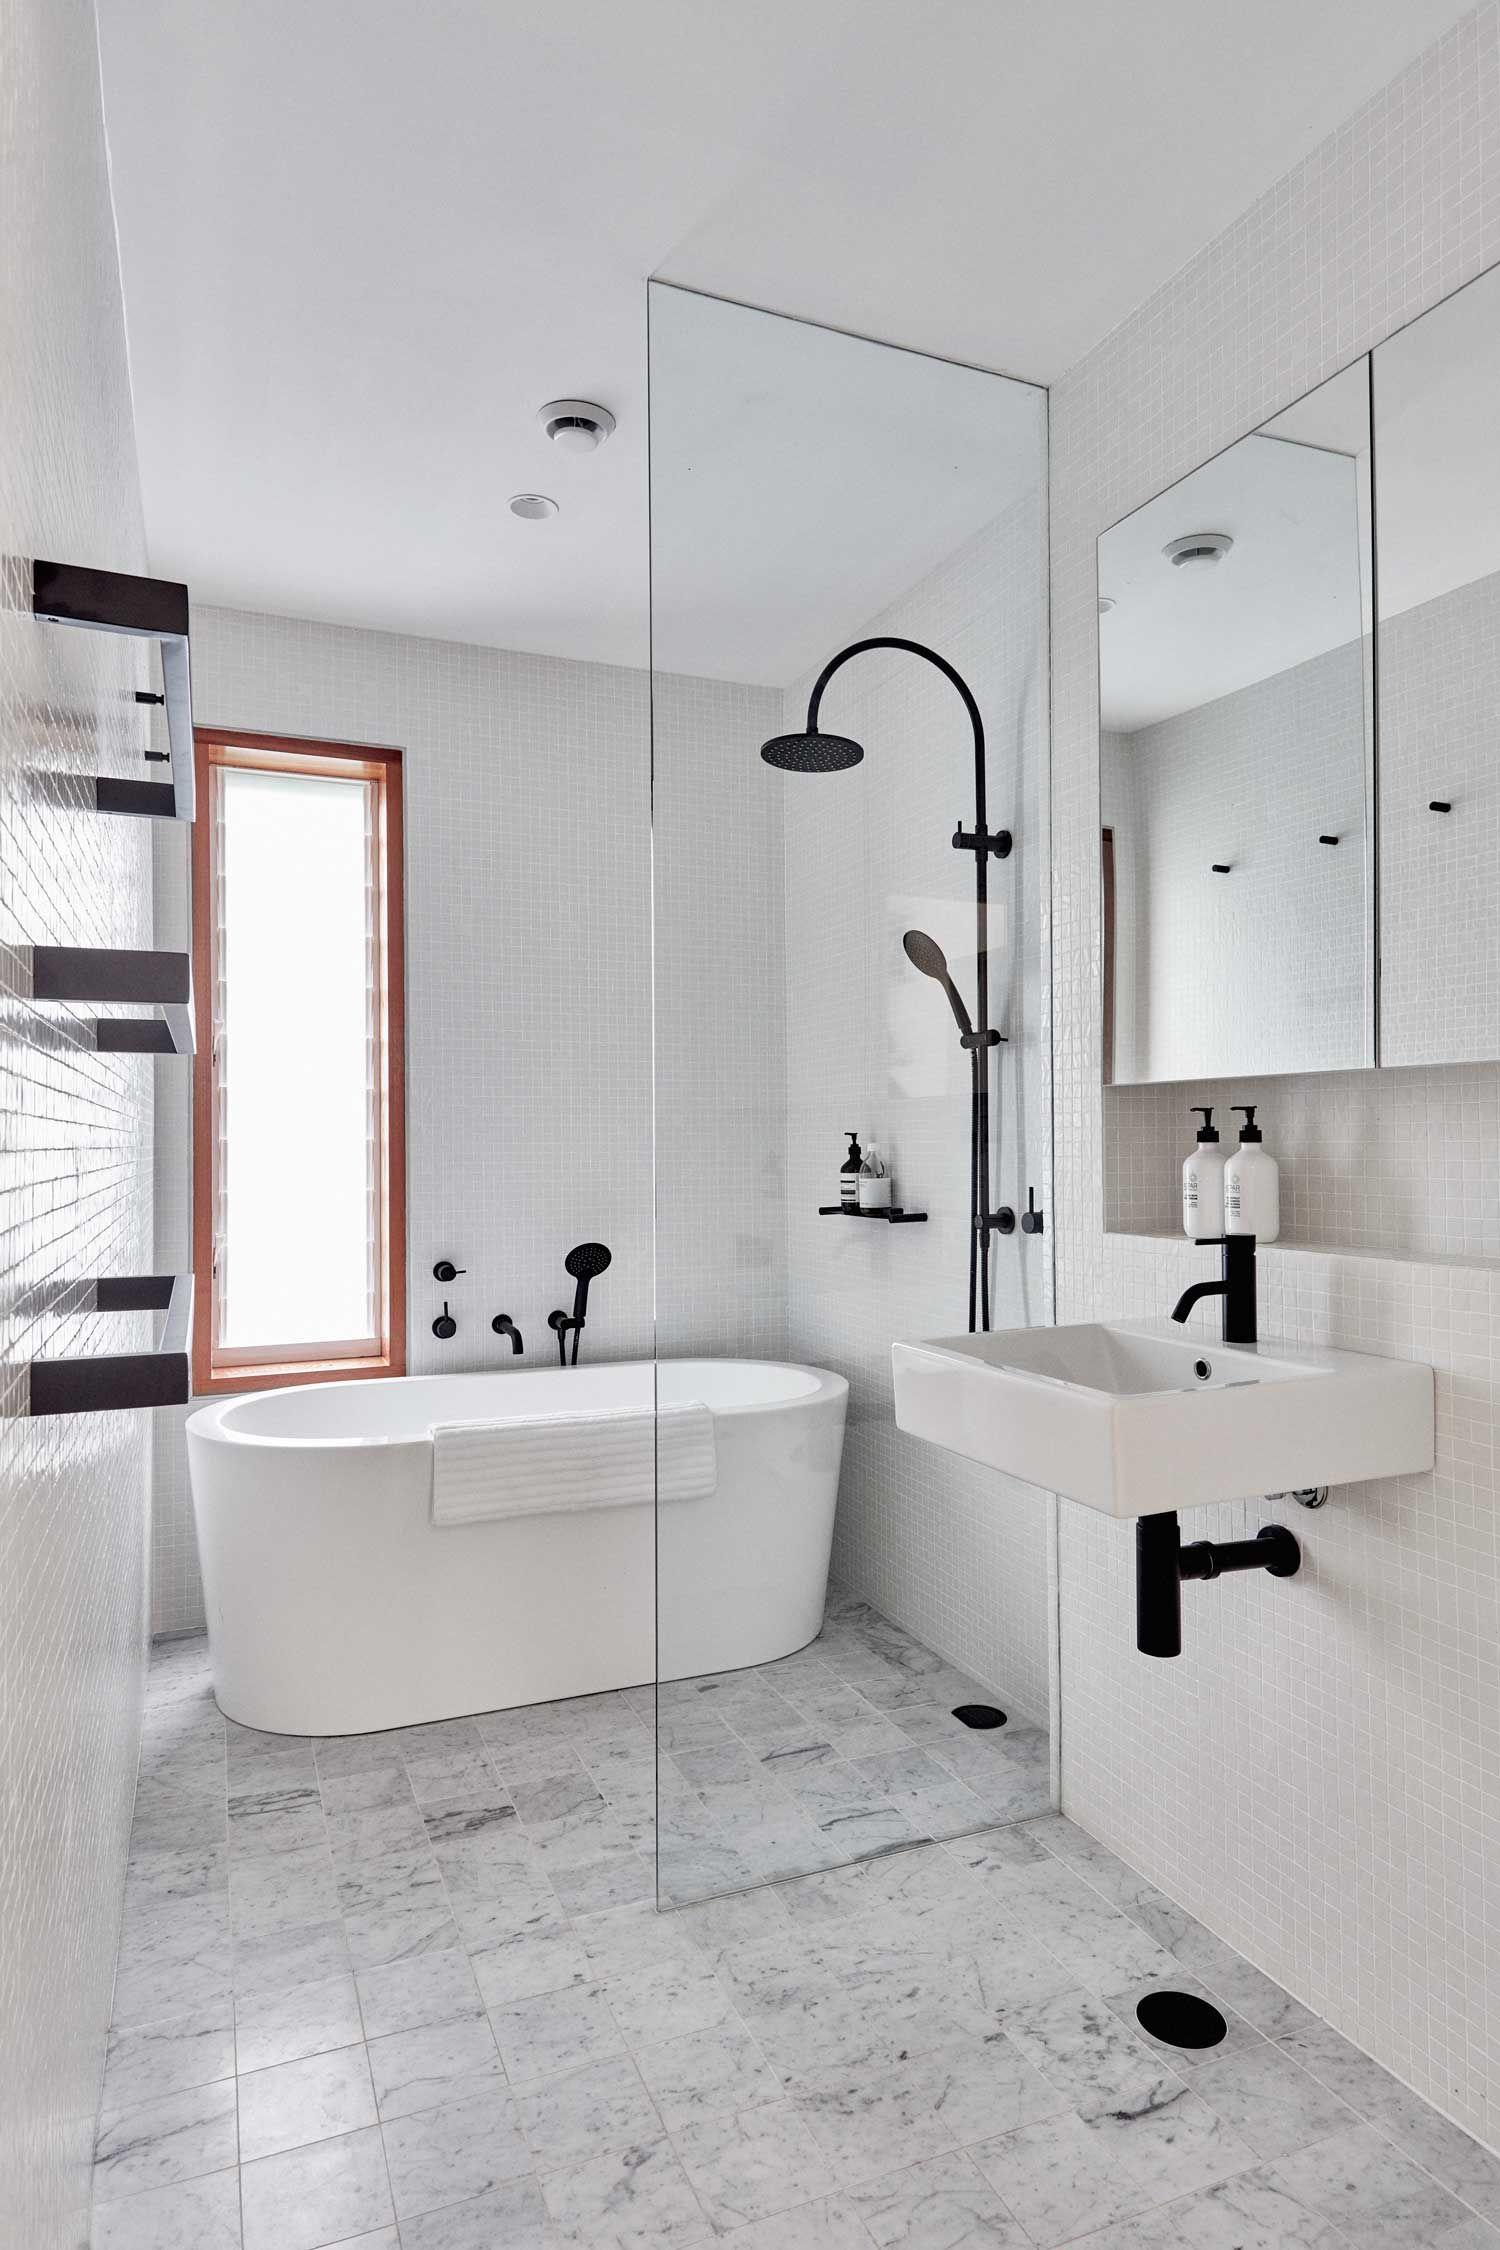 Bathroom Tile Ideas Budget